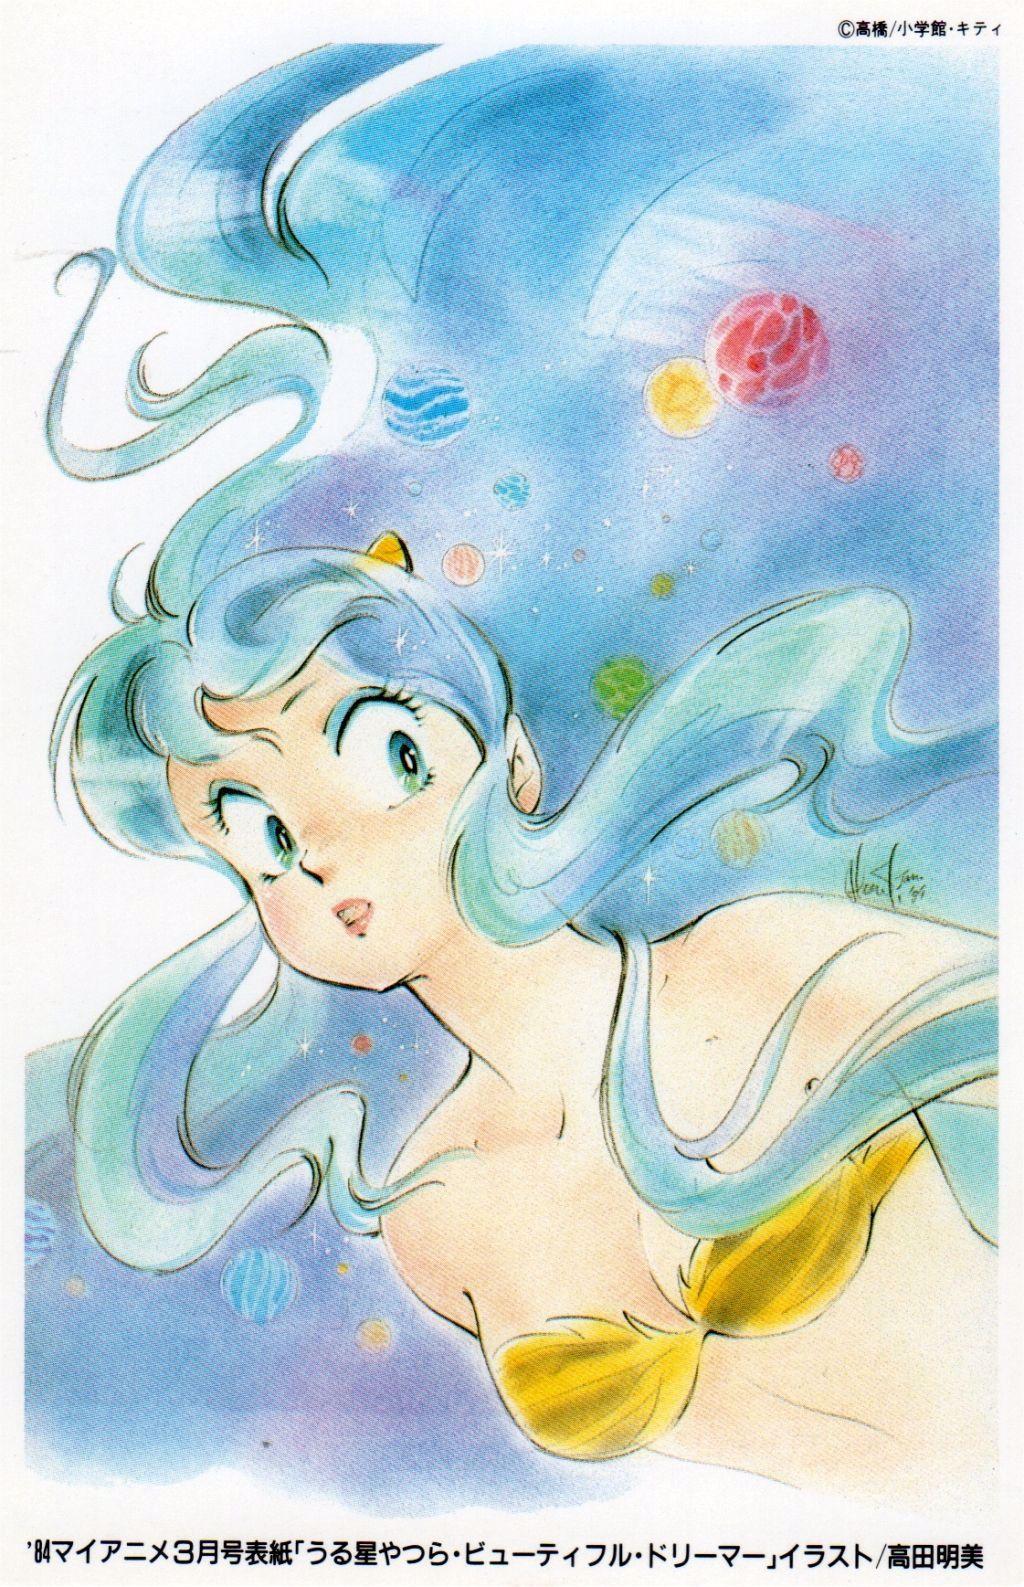 urusei yatsura postcard for the movie beautiful dreamer featuring lum illustration by akemi takada anime artwork aesthetic anime anime